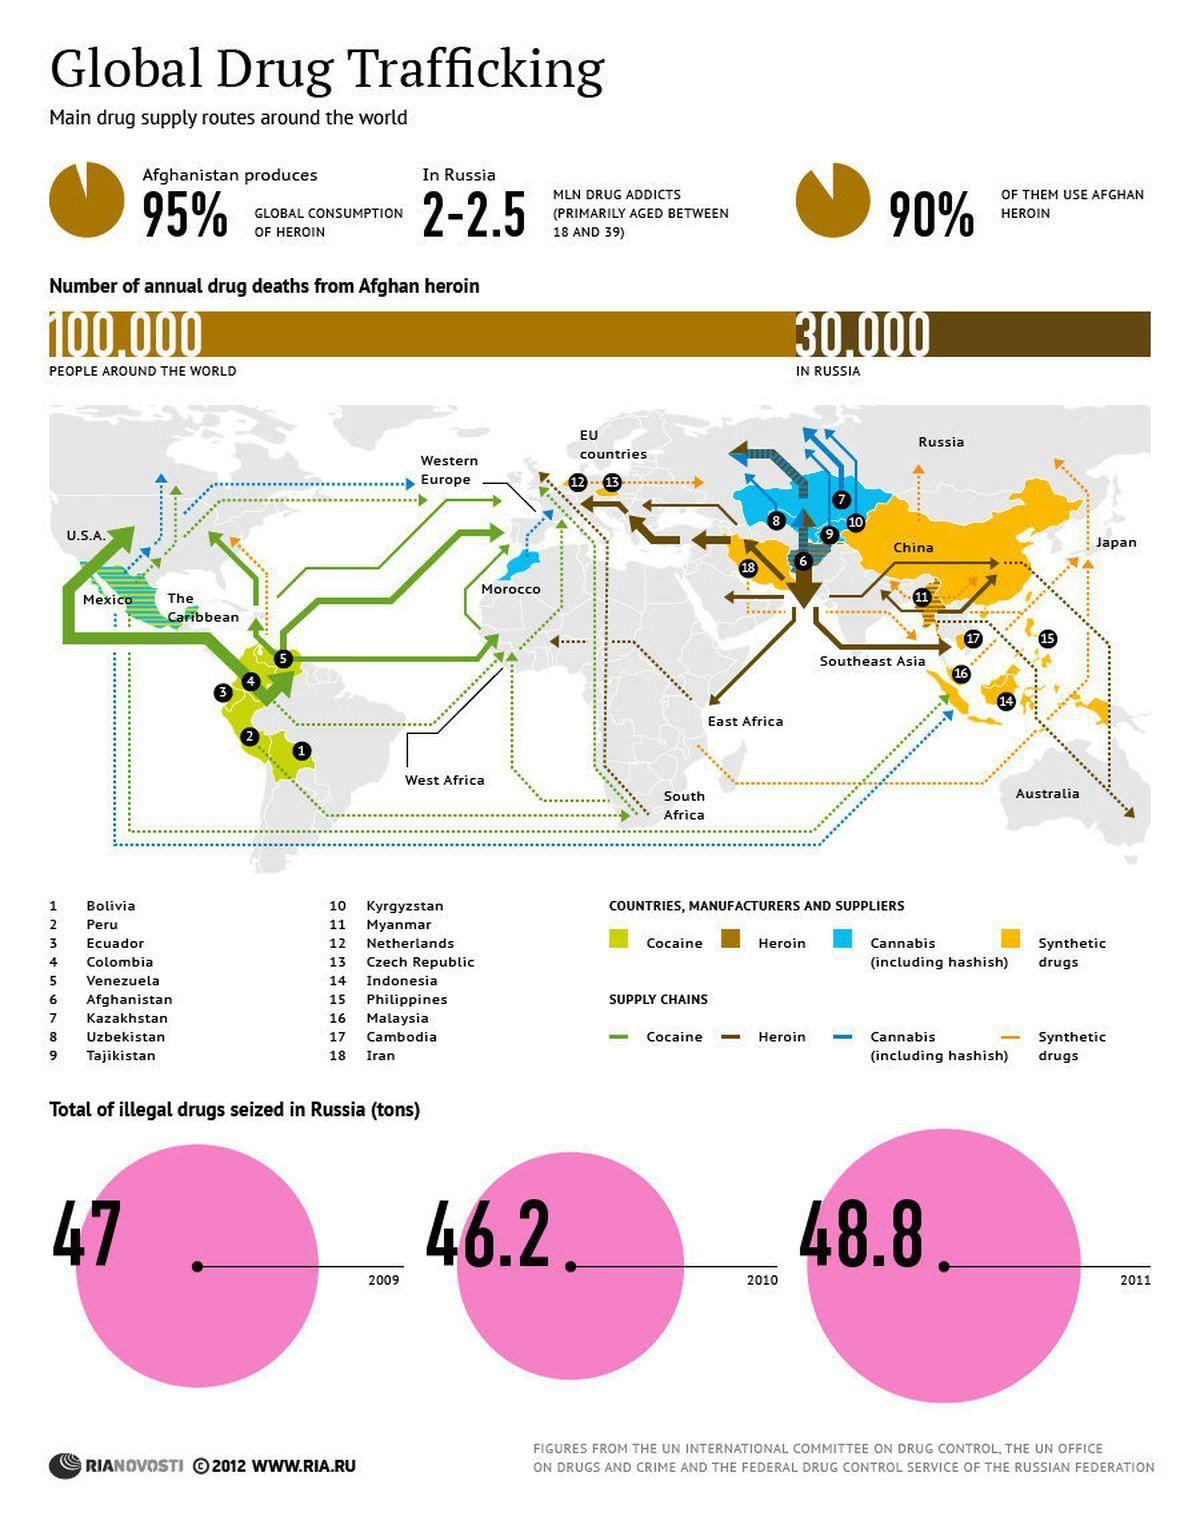 00 RIA-Novosti Infographics. Gobal Drug Trafficking. 2012